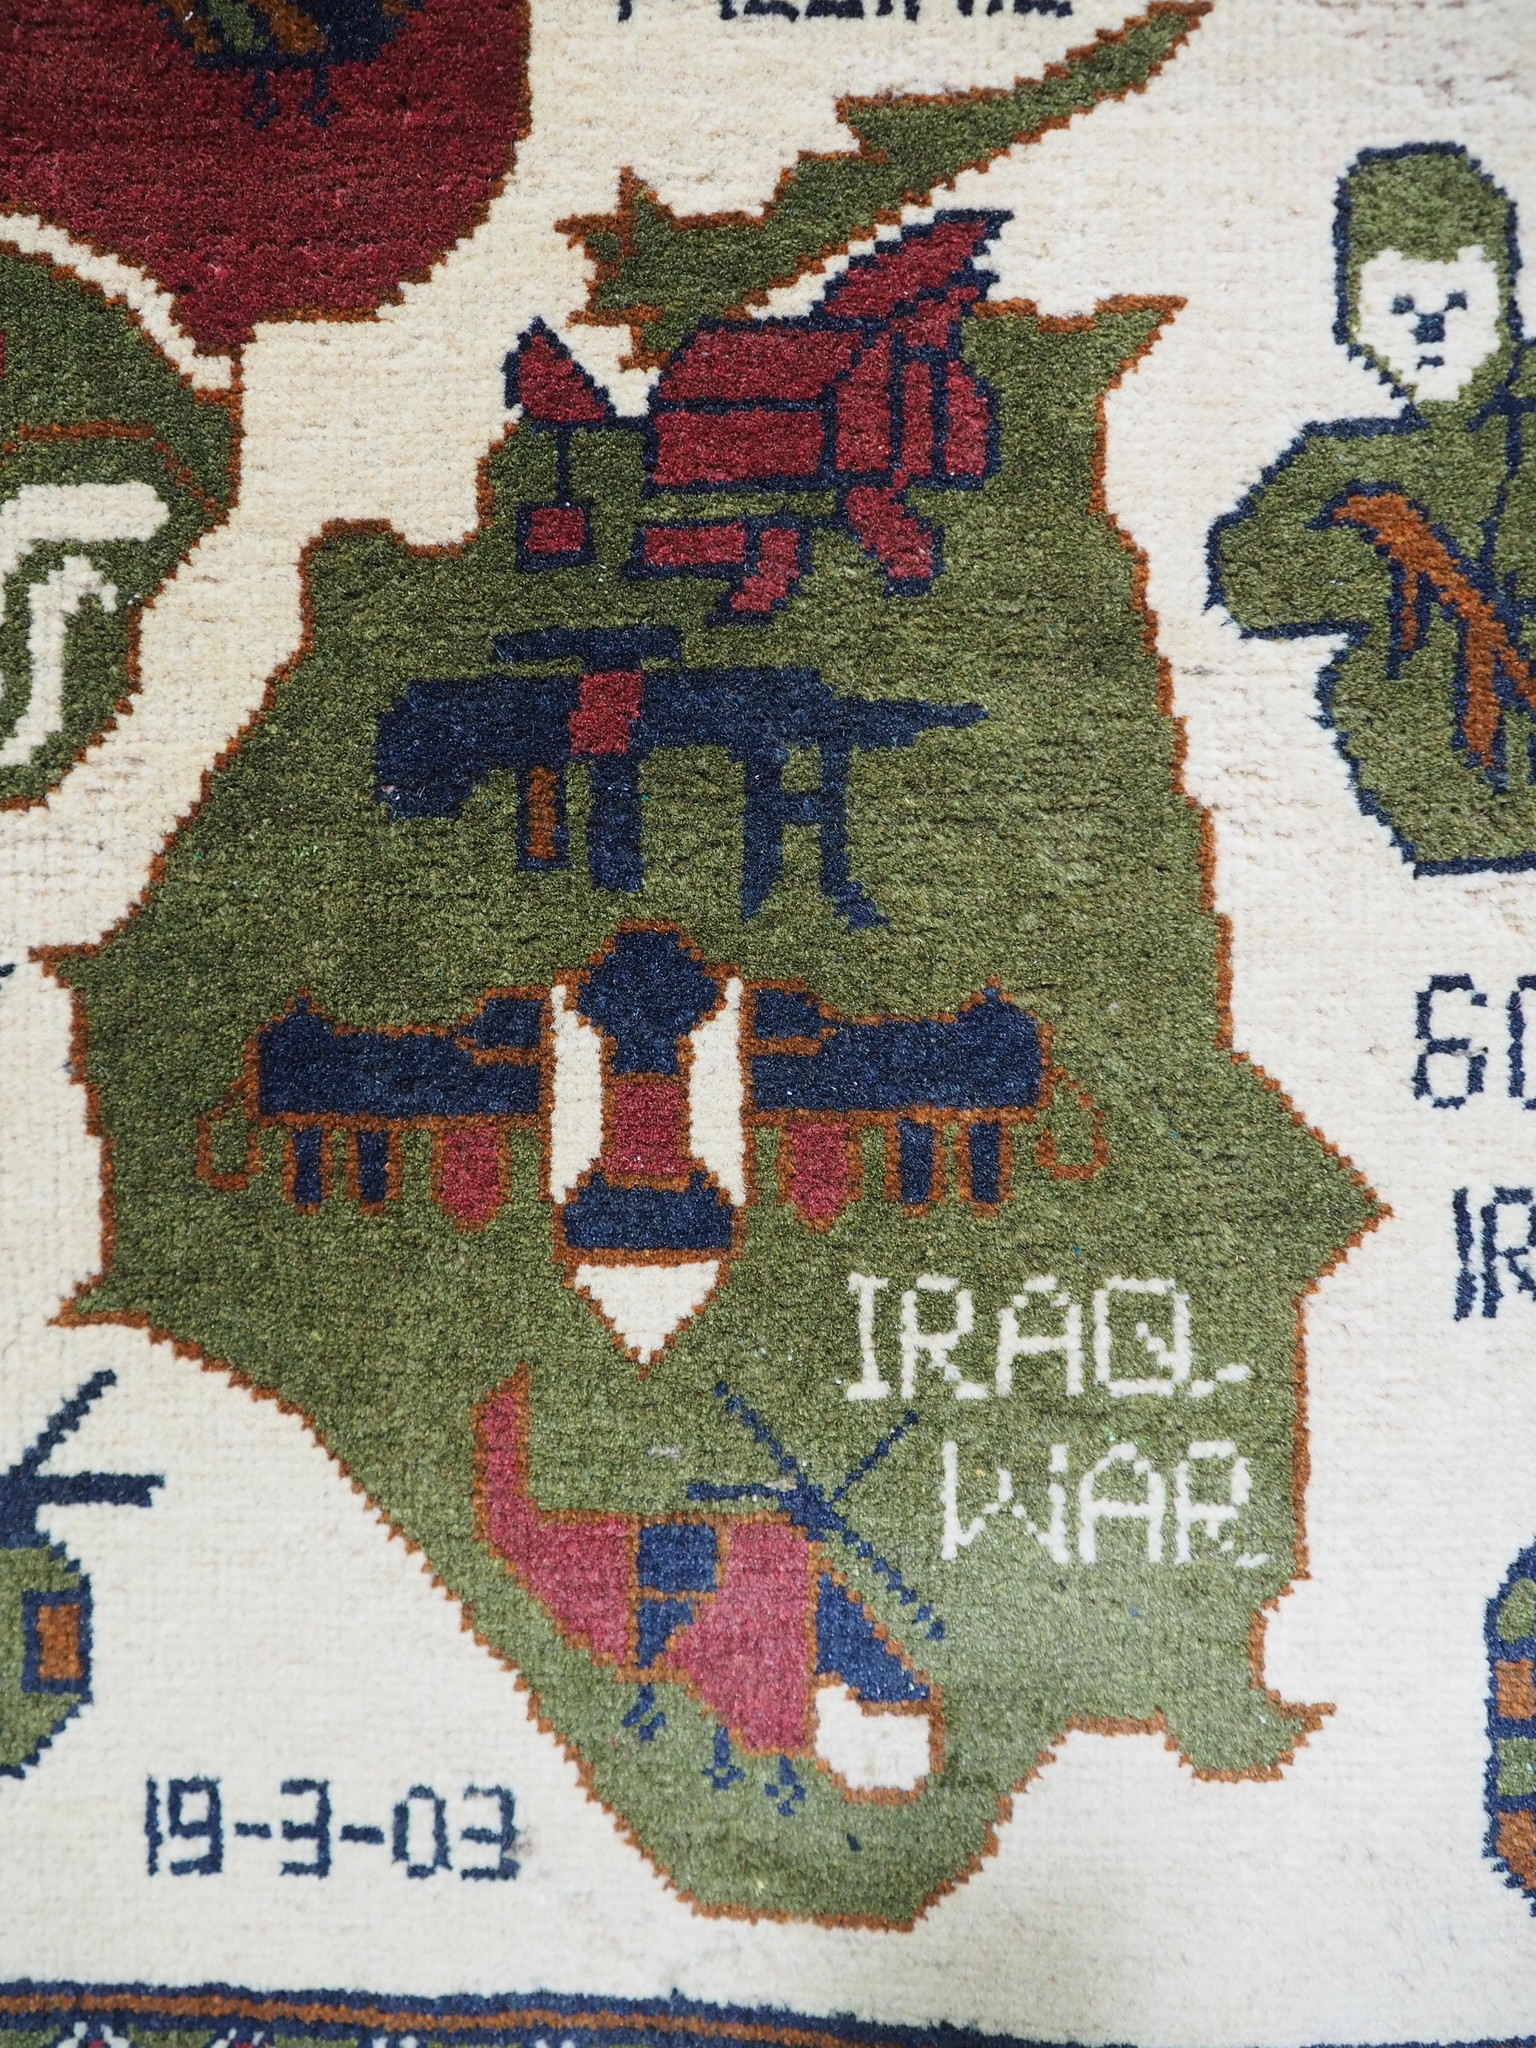 177x79 cm Afghanistan U.S.A 11 september 2001 Newyork world trade center afghan kriegteppich war rug wandteppich orientteppich Nr- WTC 21F